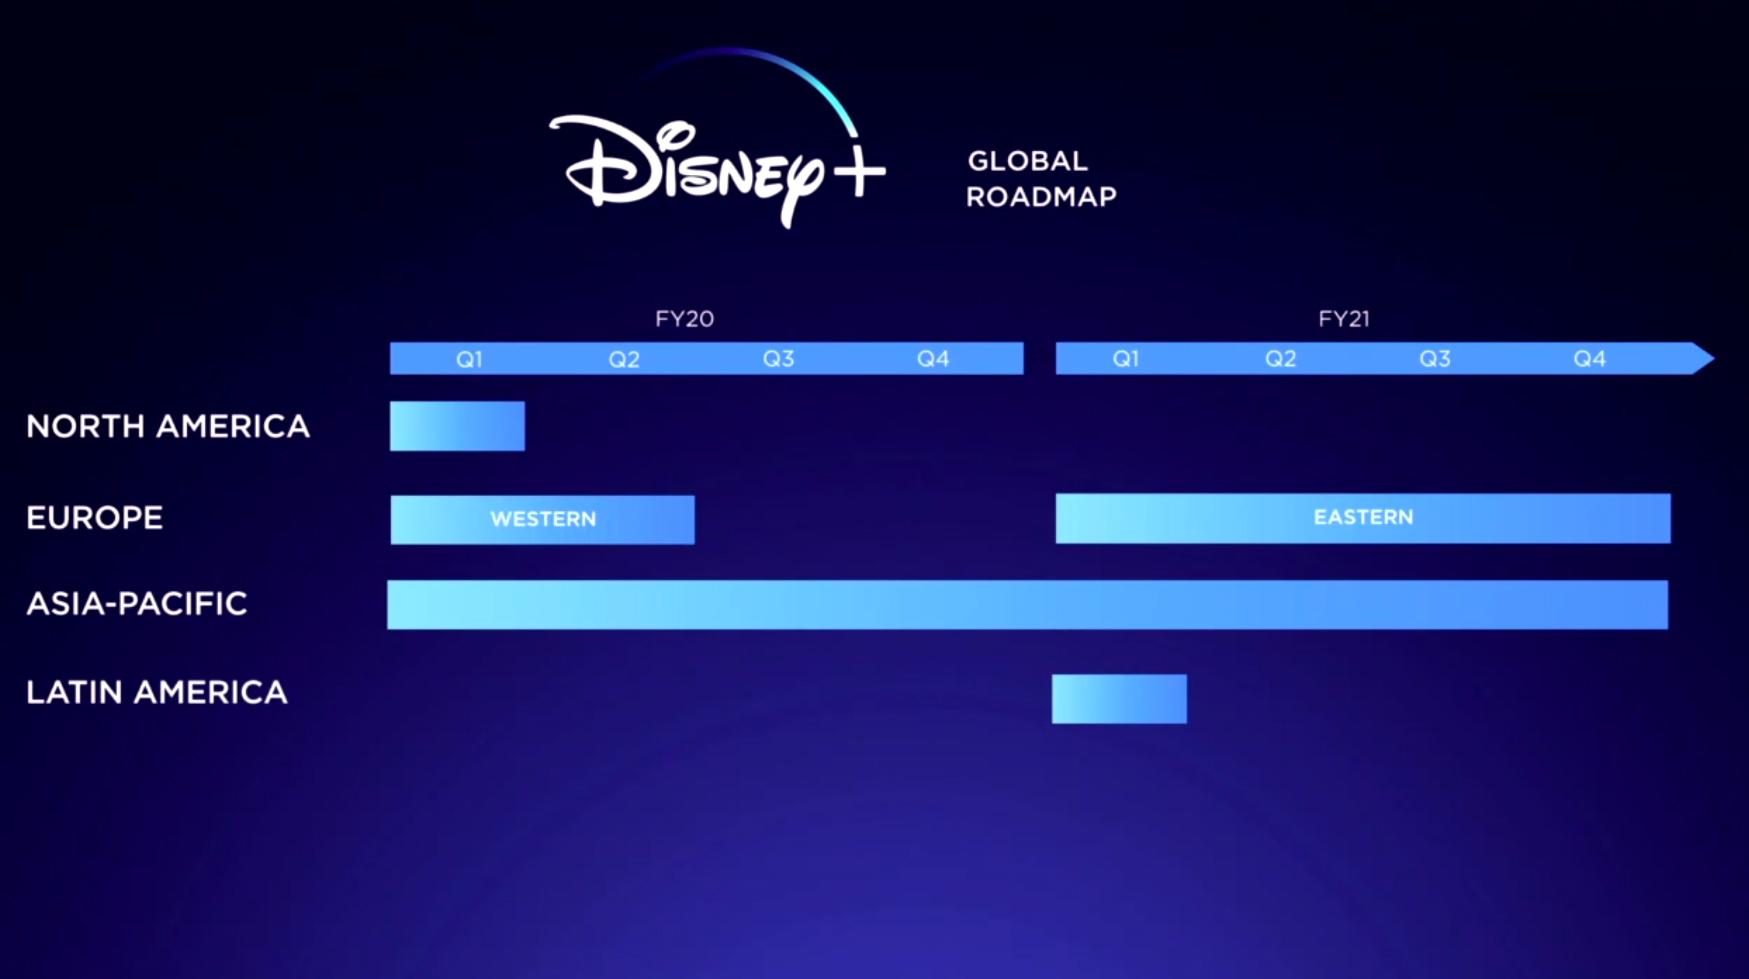 disney-plus-global-roadmap.jpg